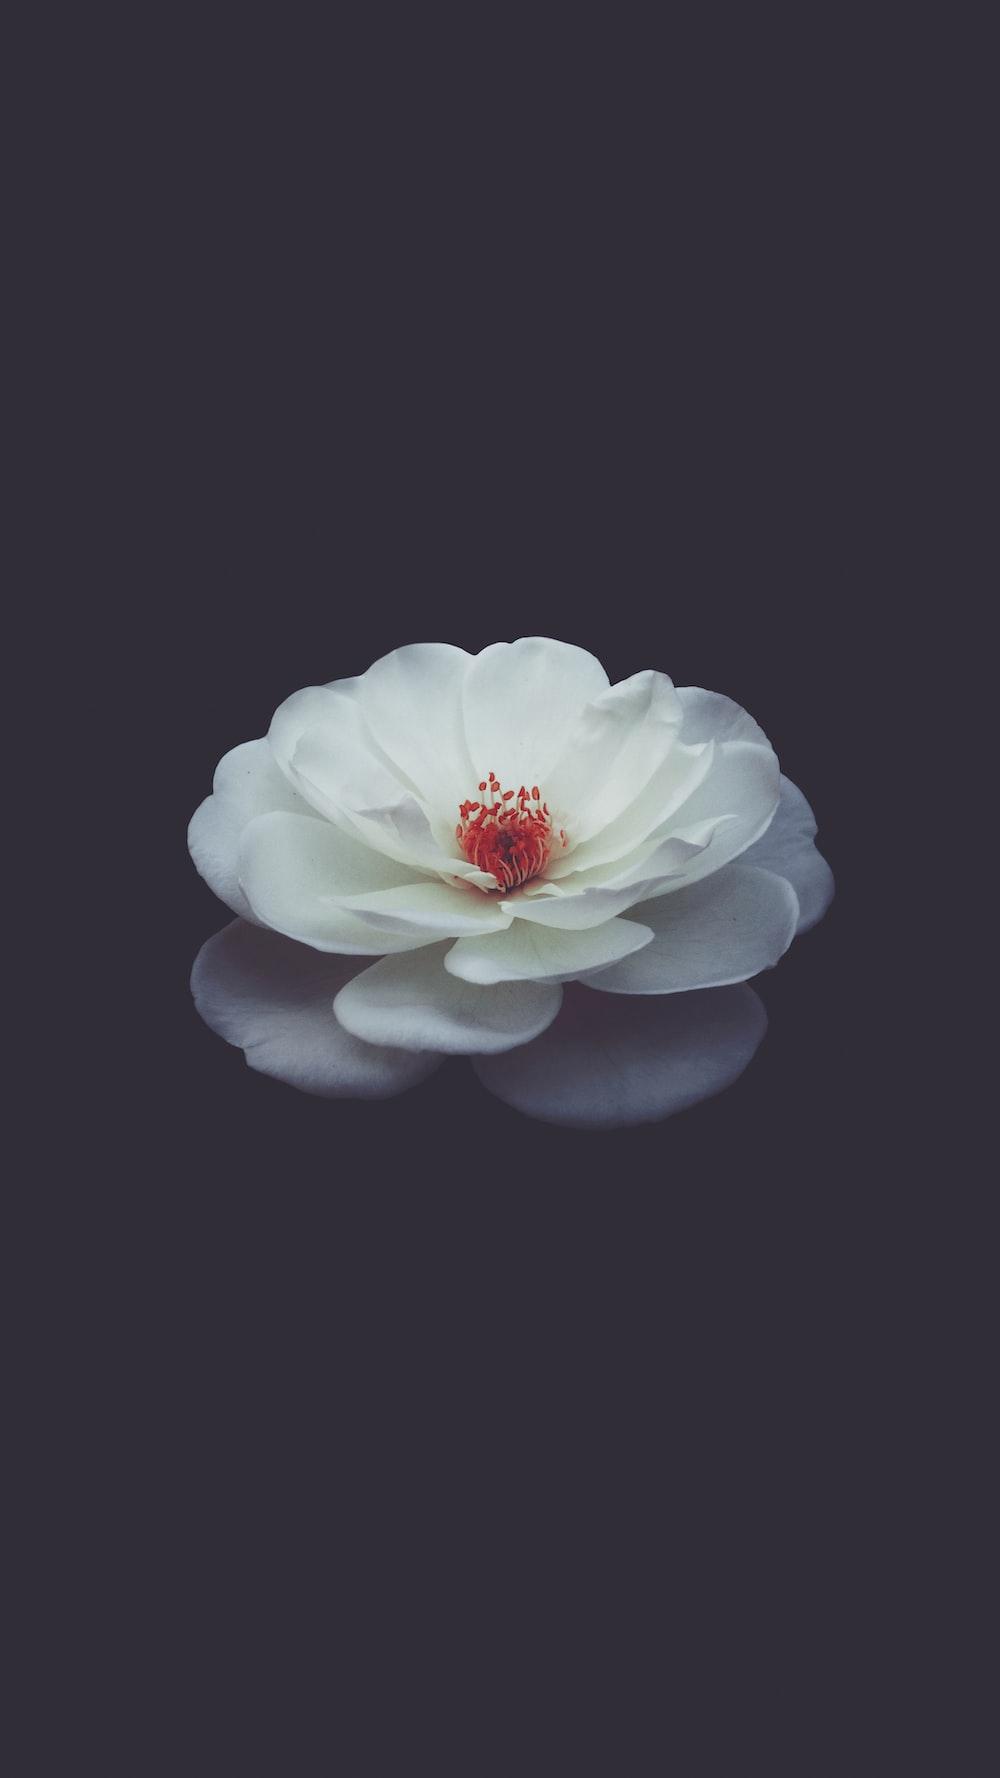 Flower Rose Petal And White Hd Photo By Majid Rangraz